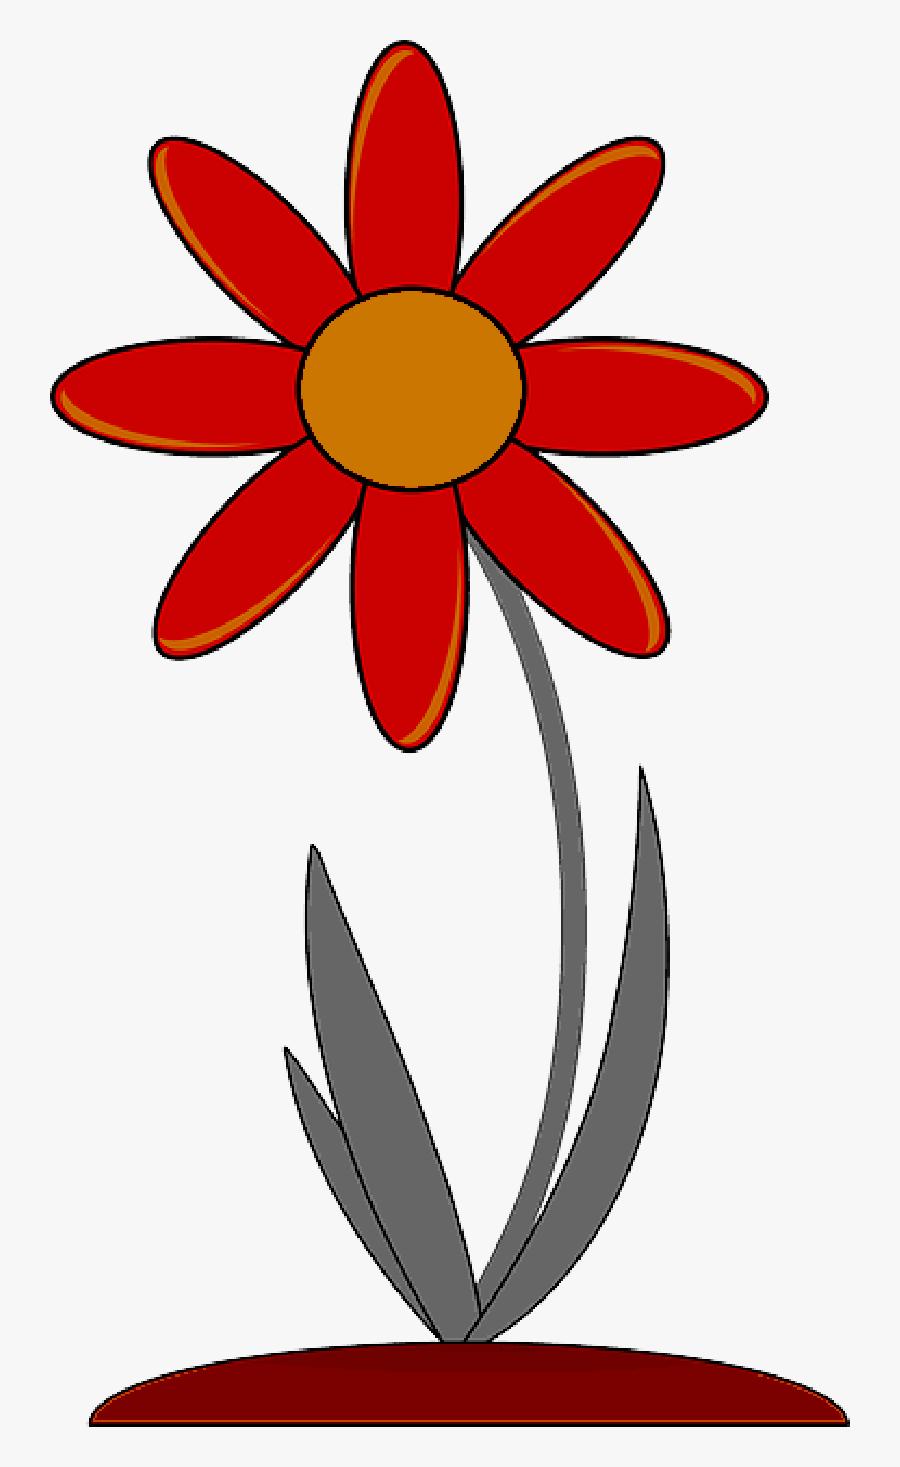 Red, Outline, Drawing, Plants, Flower, Flowers, Cartoon - Flower Clip Art, Transparent Clipart